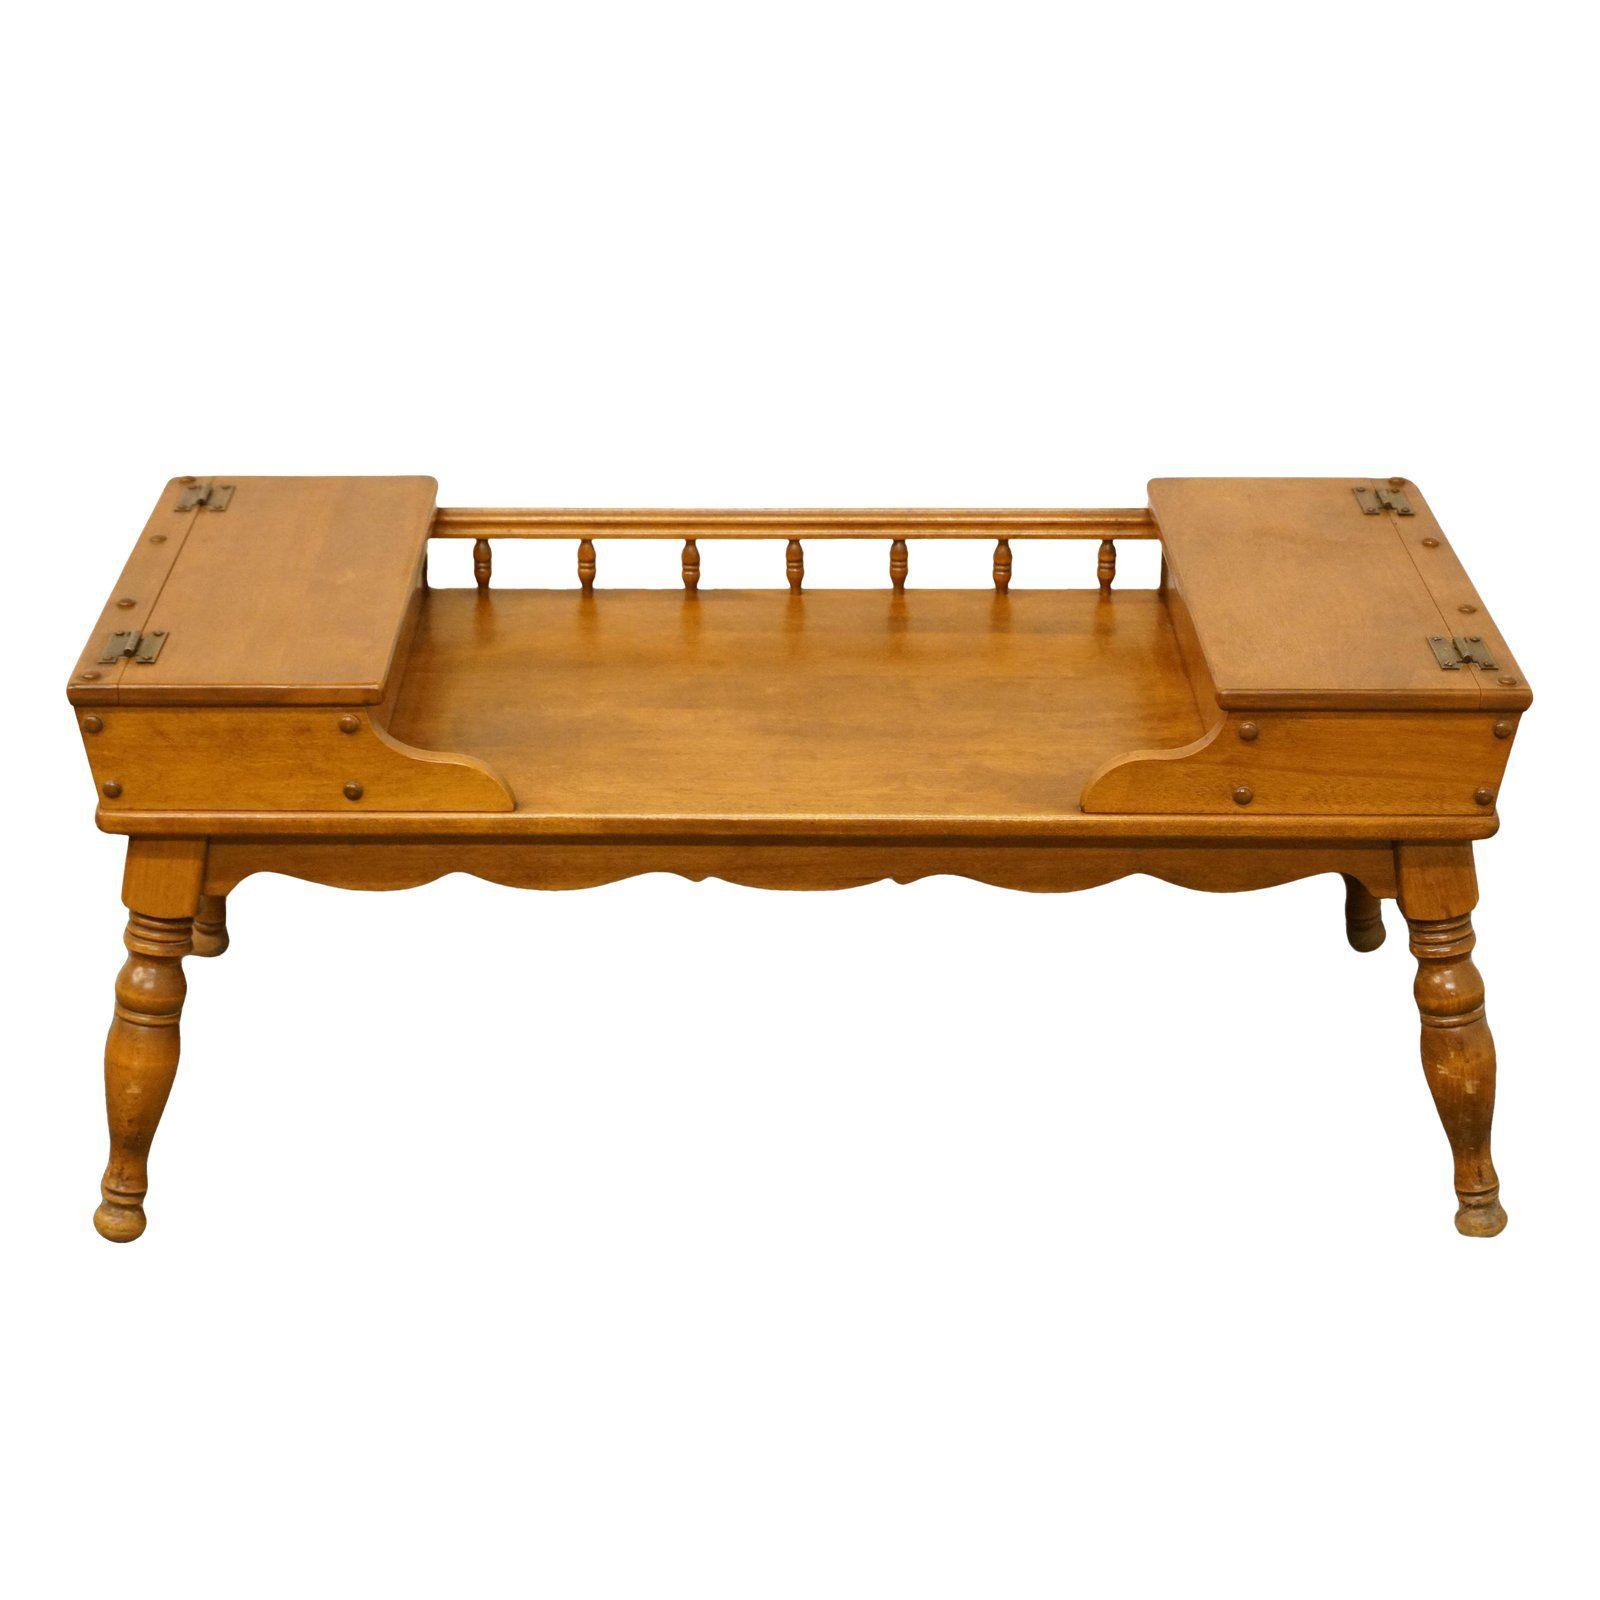 20th century early american ethan allen heirloom nutmeg